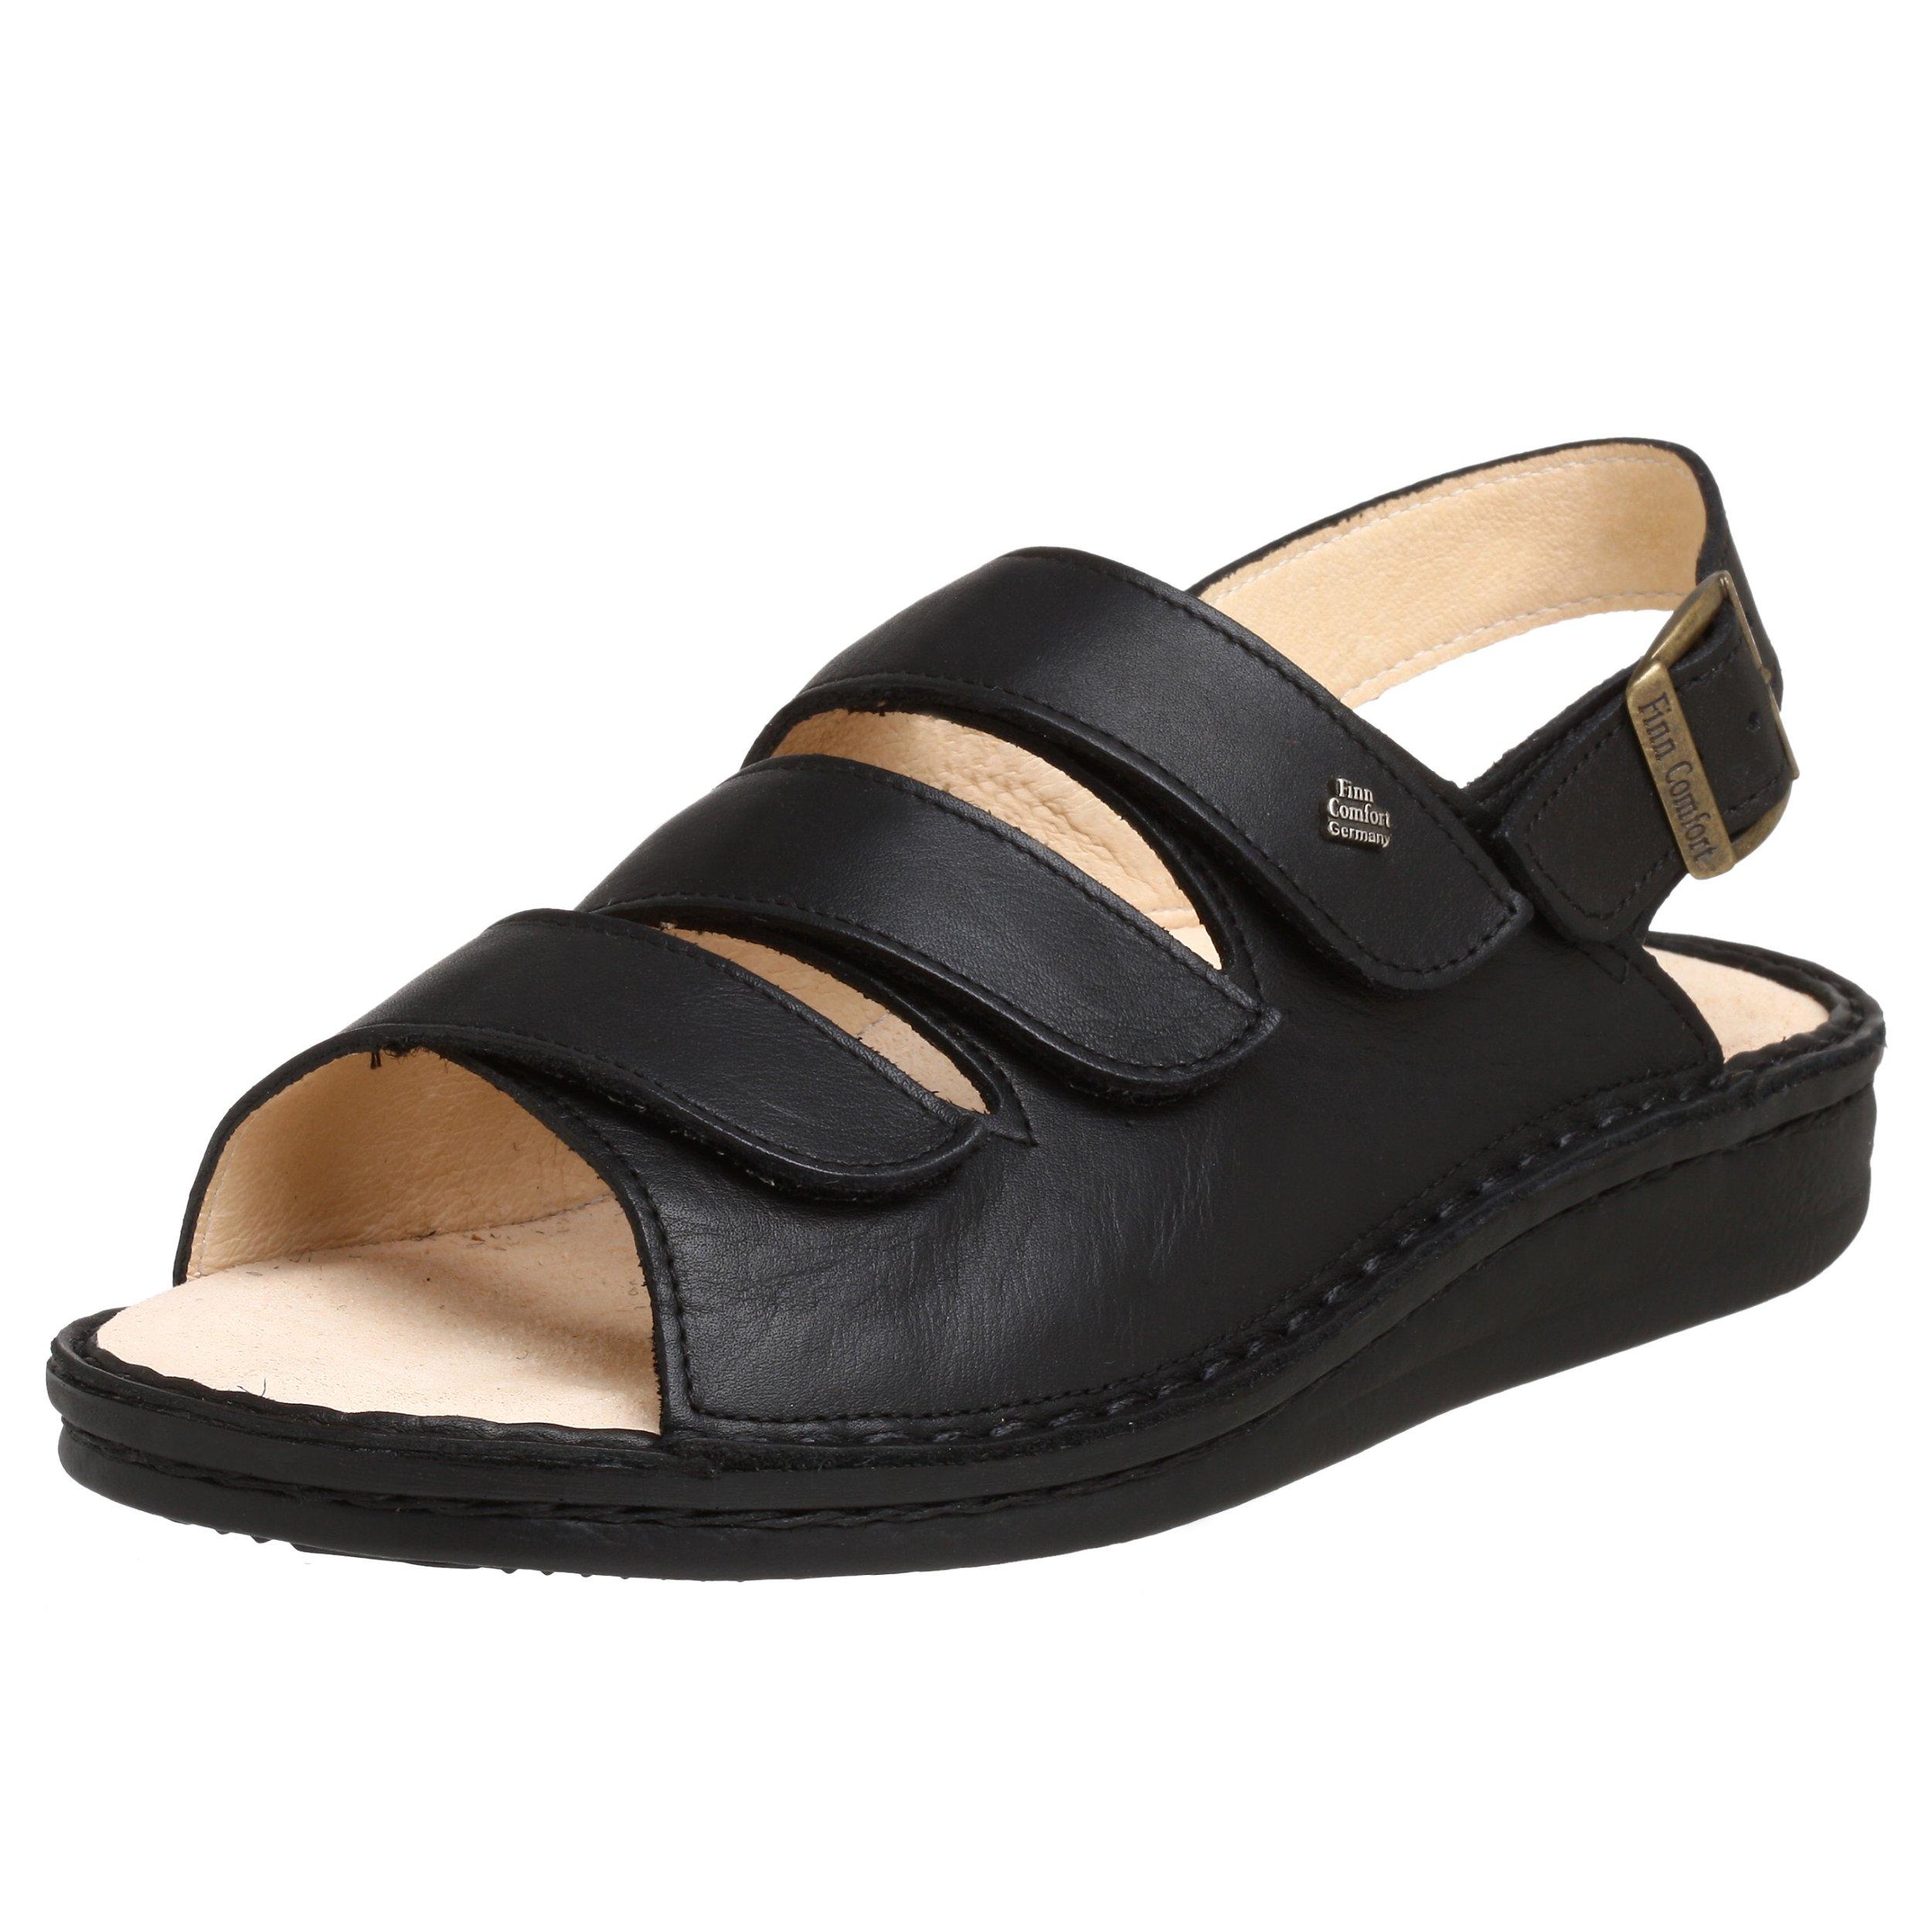 Finn Comfort Women's Sylt Sandal,Black Nappa,38 EU (US Women's 7 M)